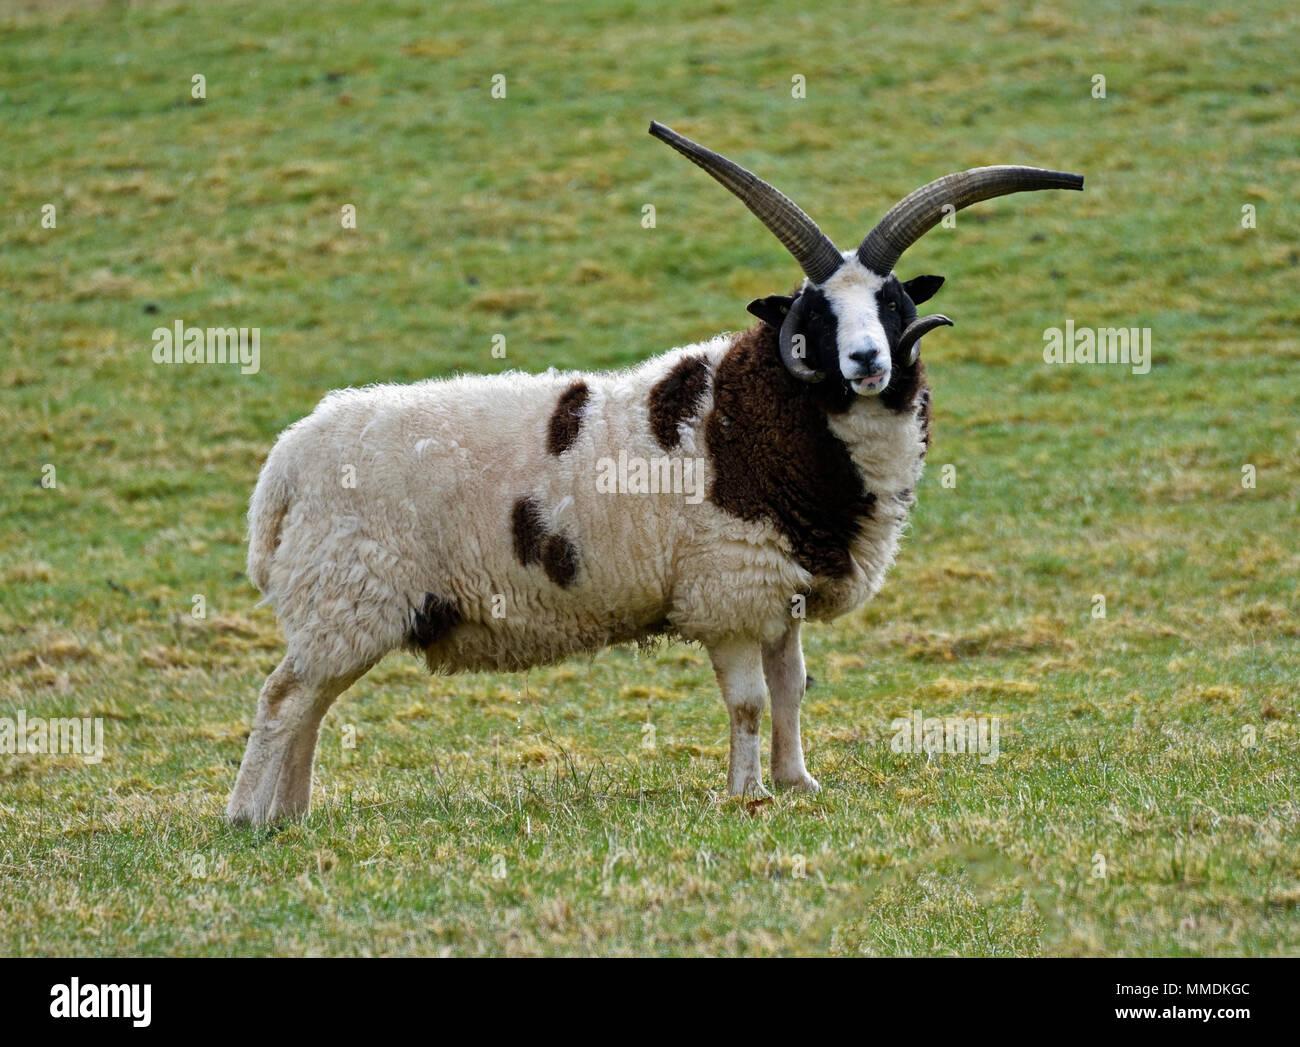 Jacob Sheep. Cleghorn, Lanarkshire, Scotland, United Kingdom, Europe. - Stock Image